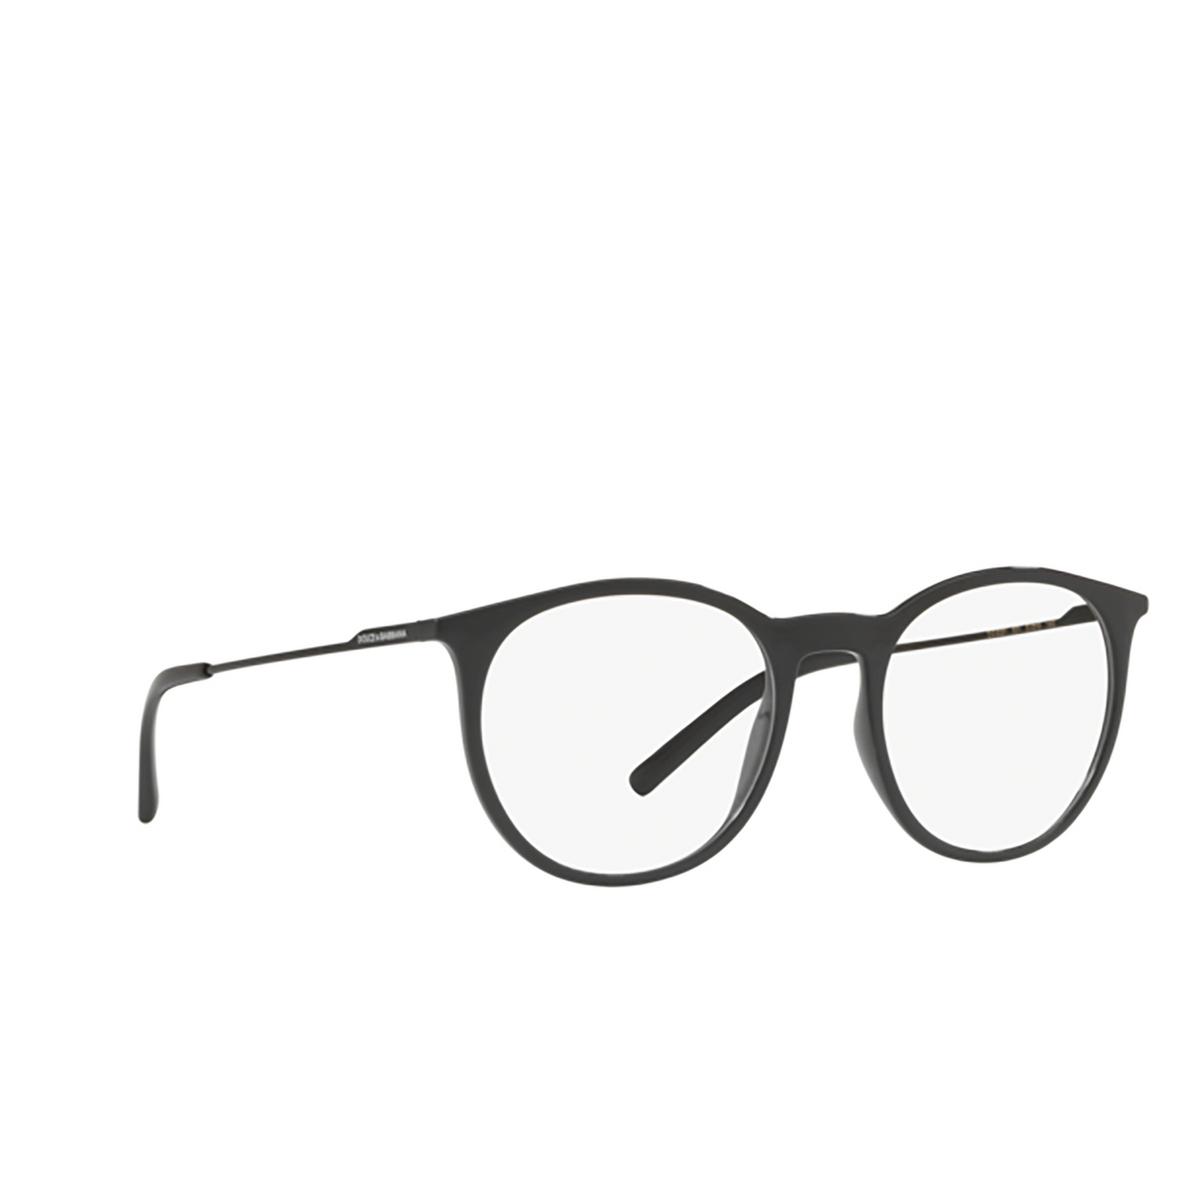 Dolce & Gabbana® Round Eyeglasses: DG5031 color 501 - three-quarters view.